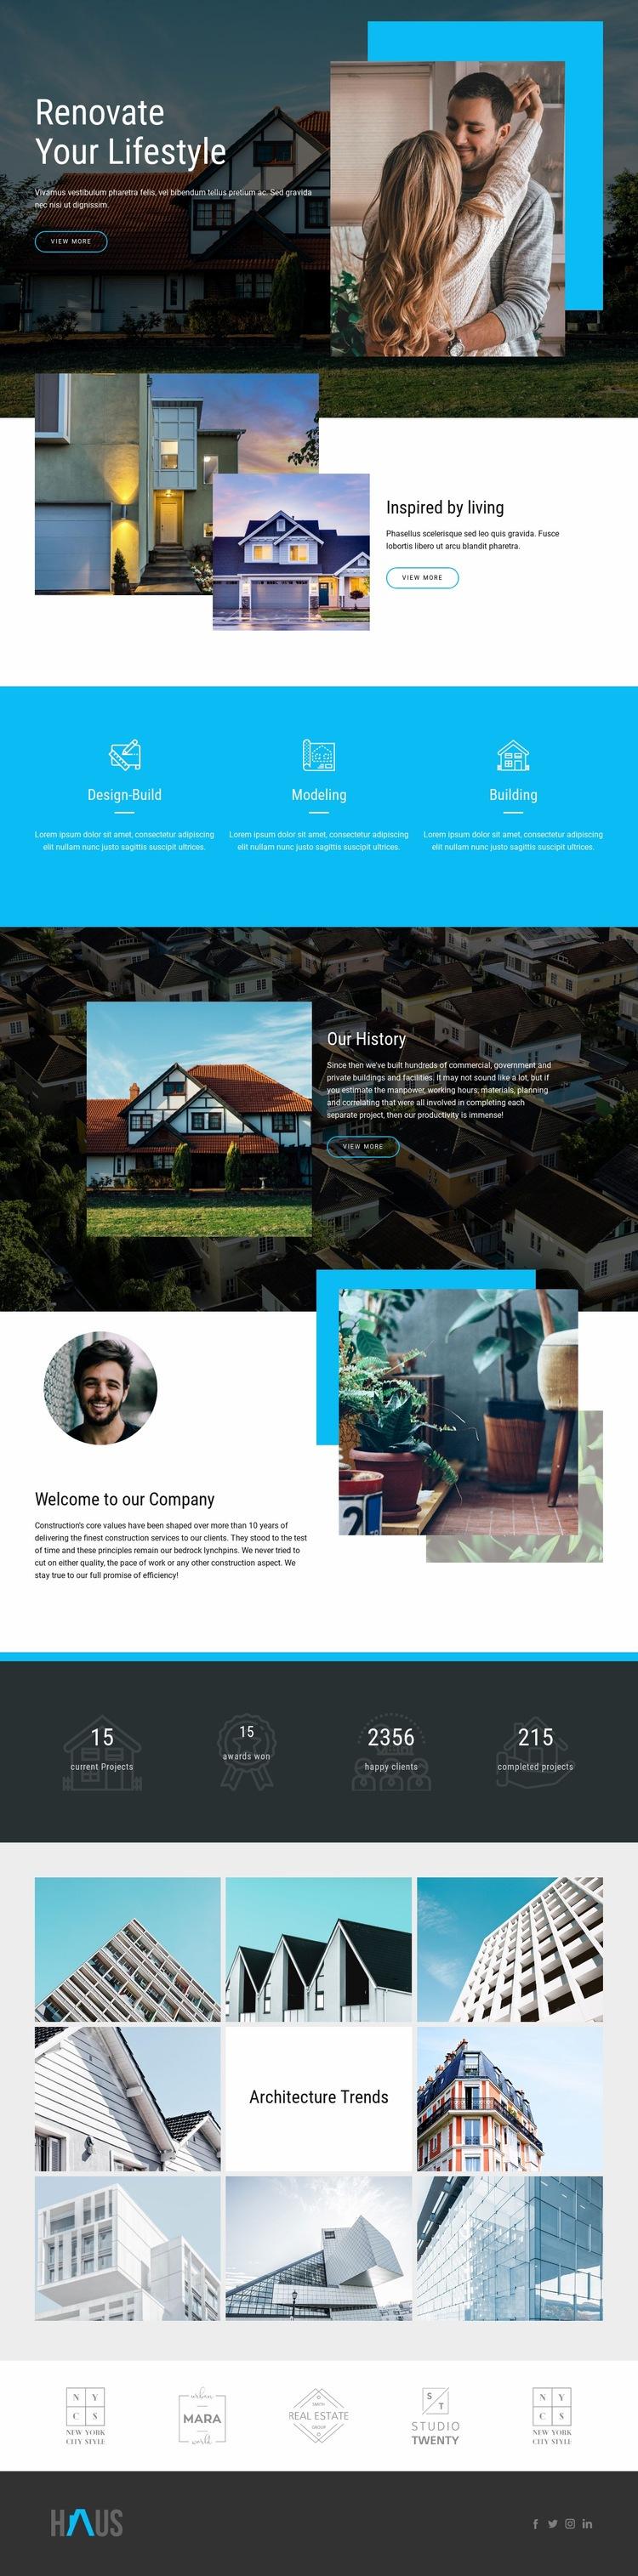 Renovate real estate Wysiwyg Editor Html